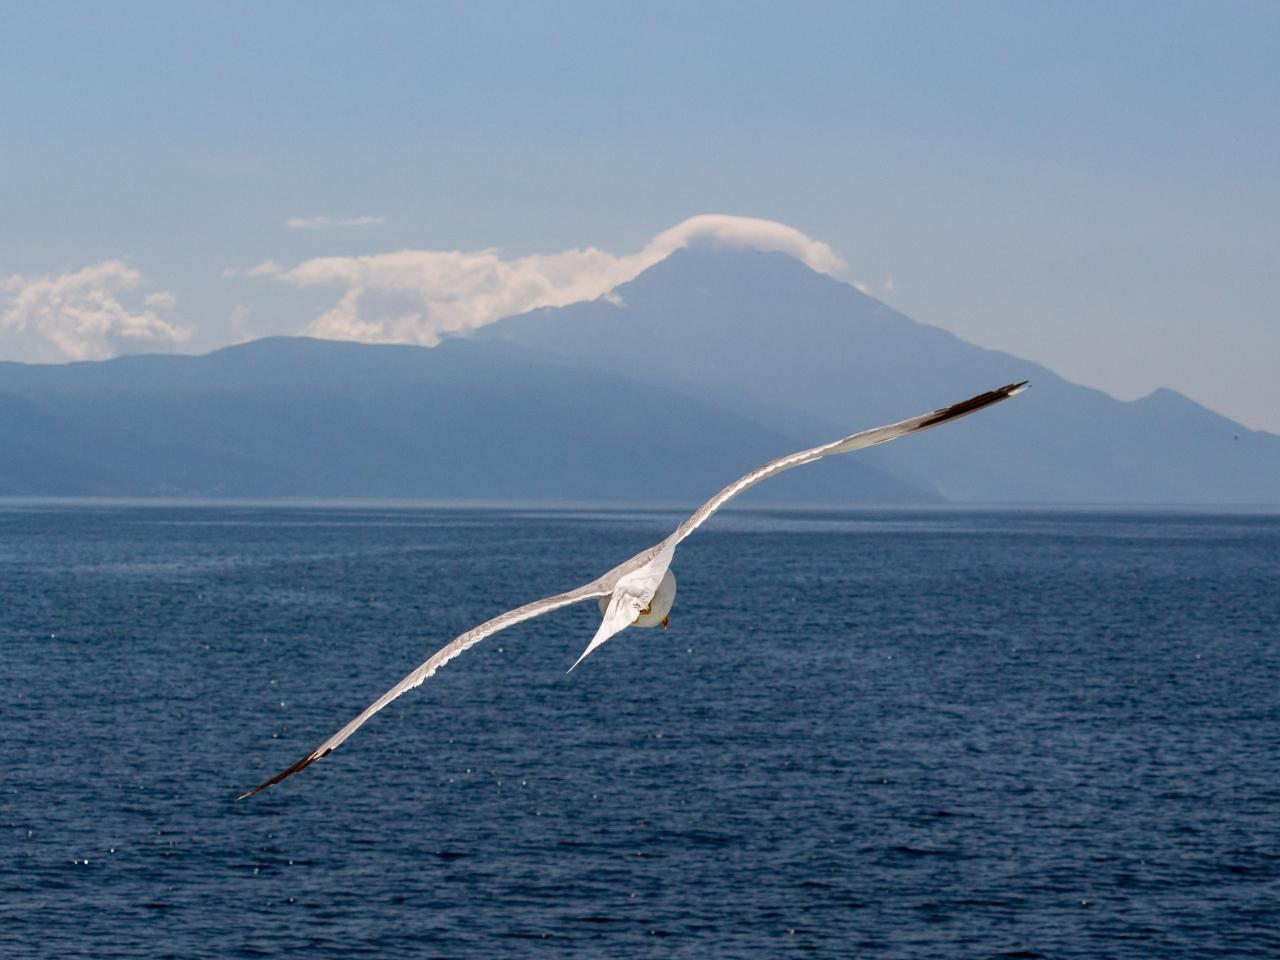 White bird, flight, sea, seagull, 1280x960 wallpaper